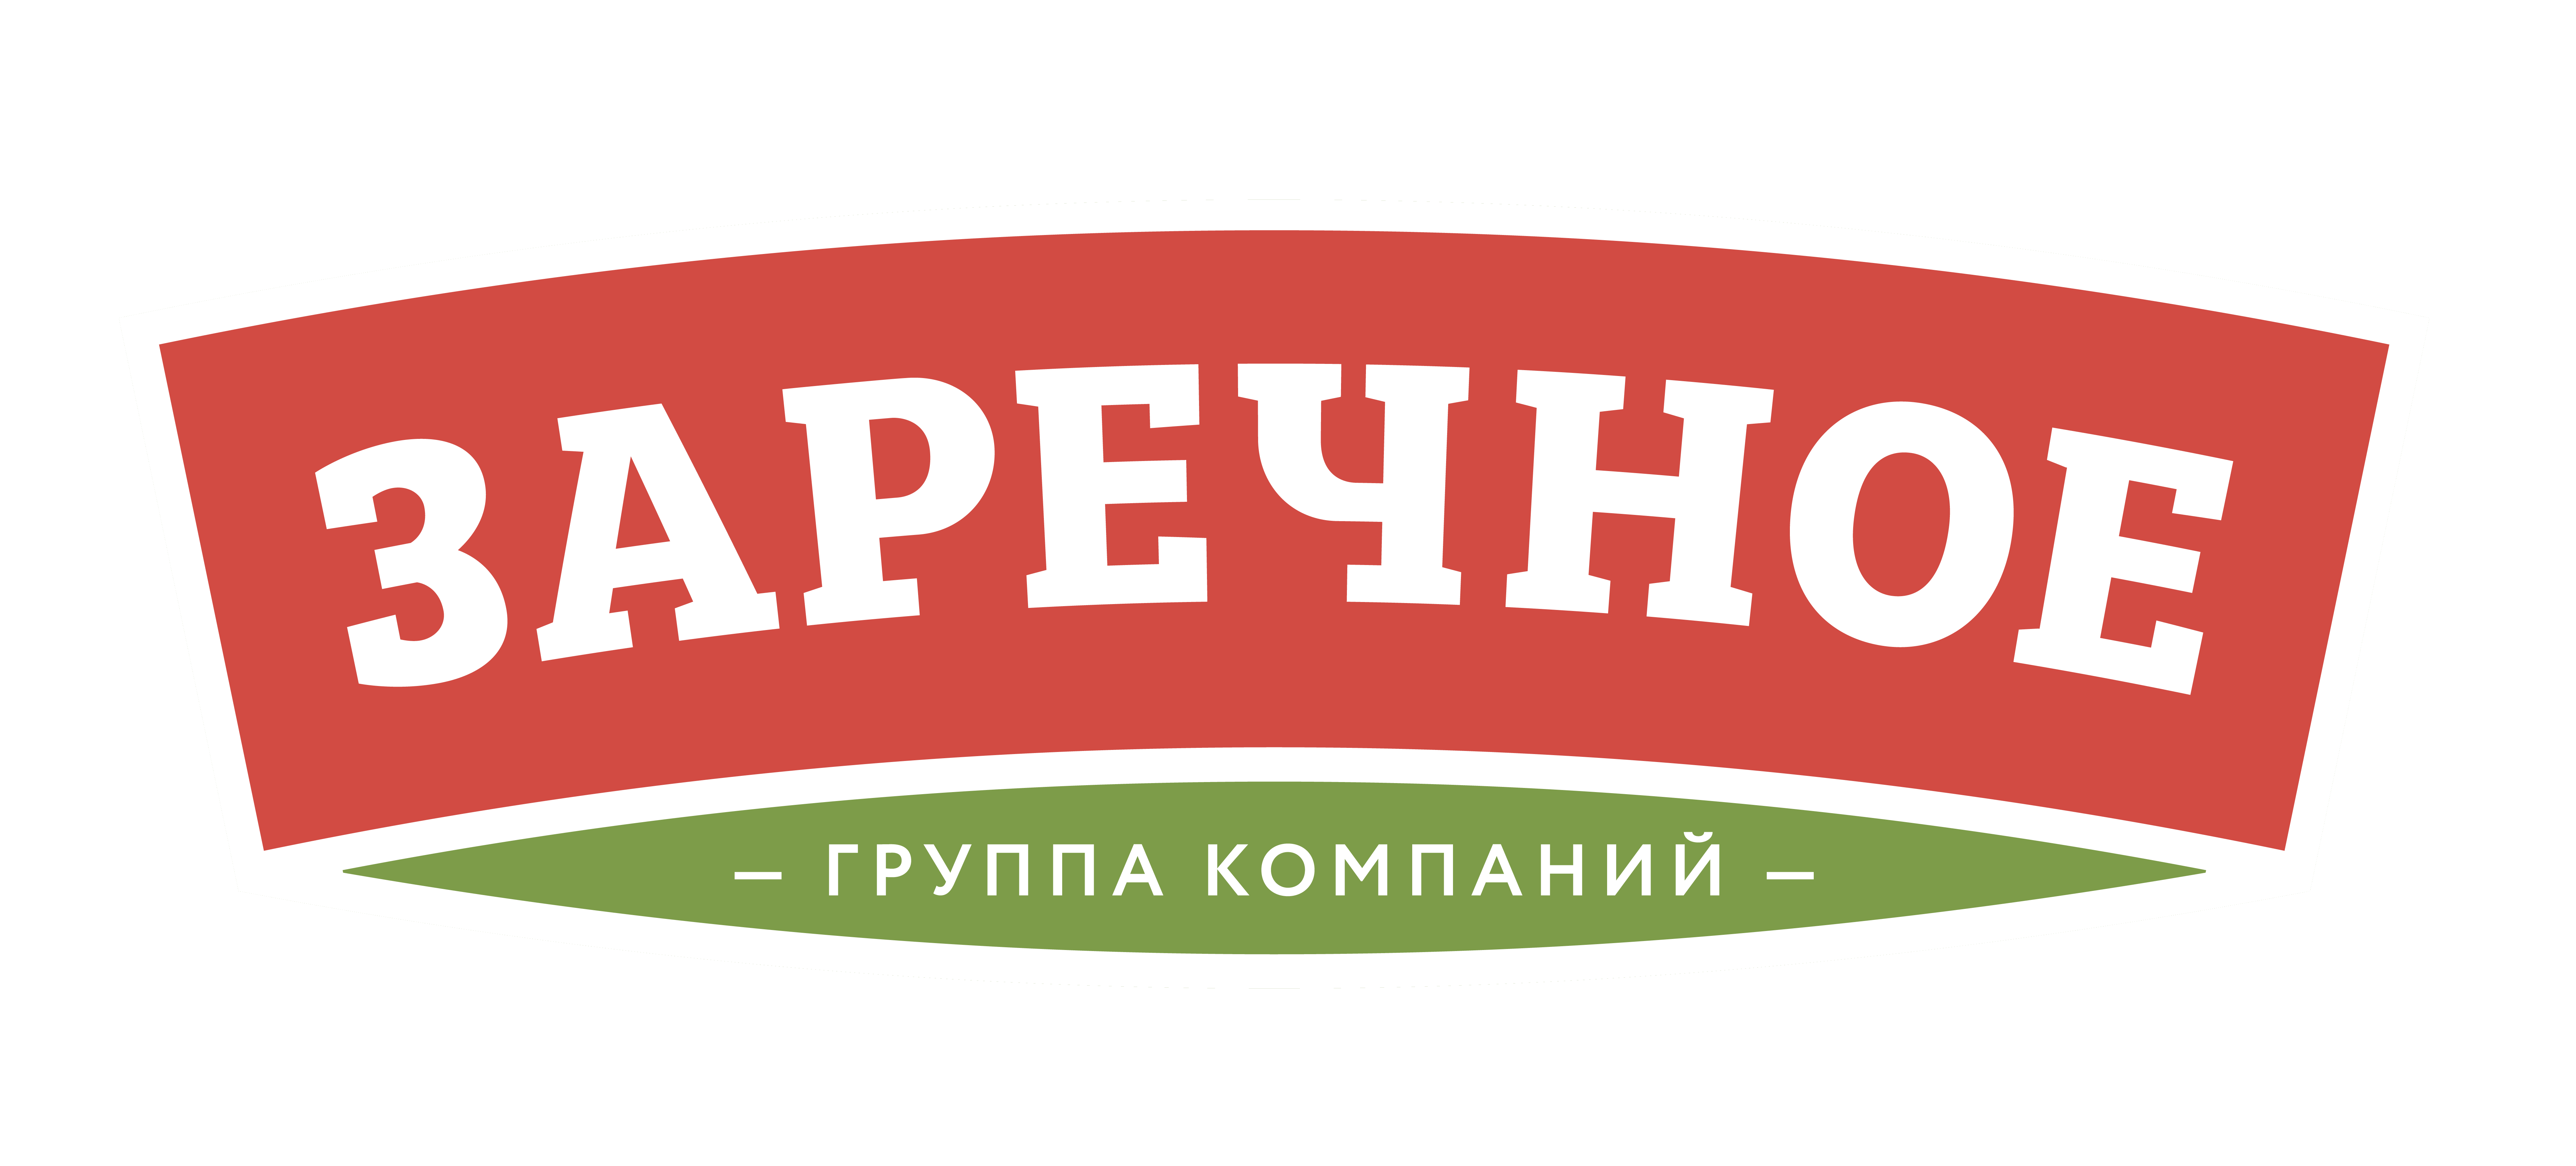 Zarechnoe.png